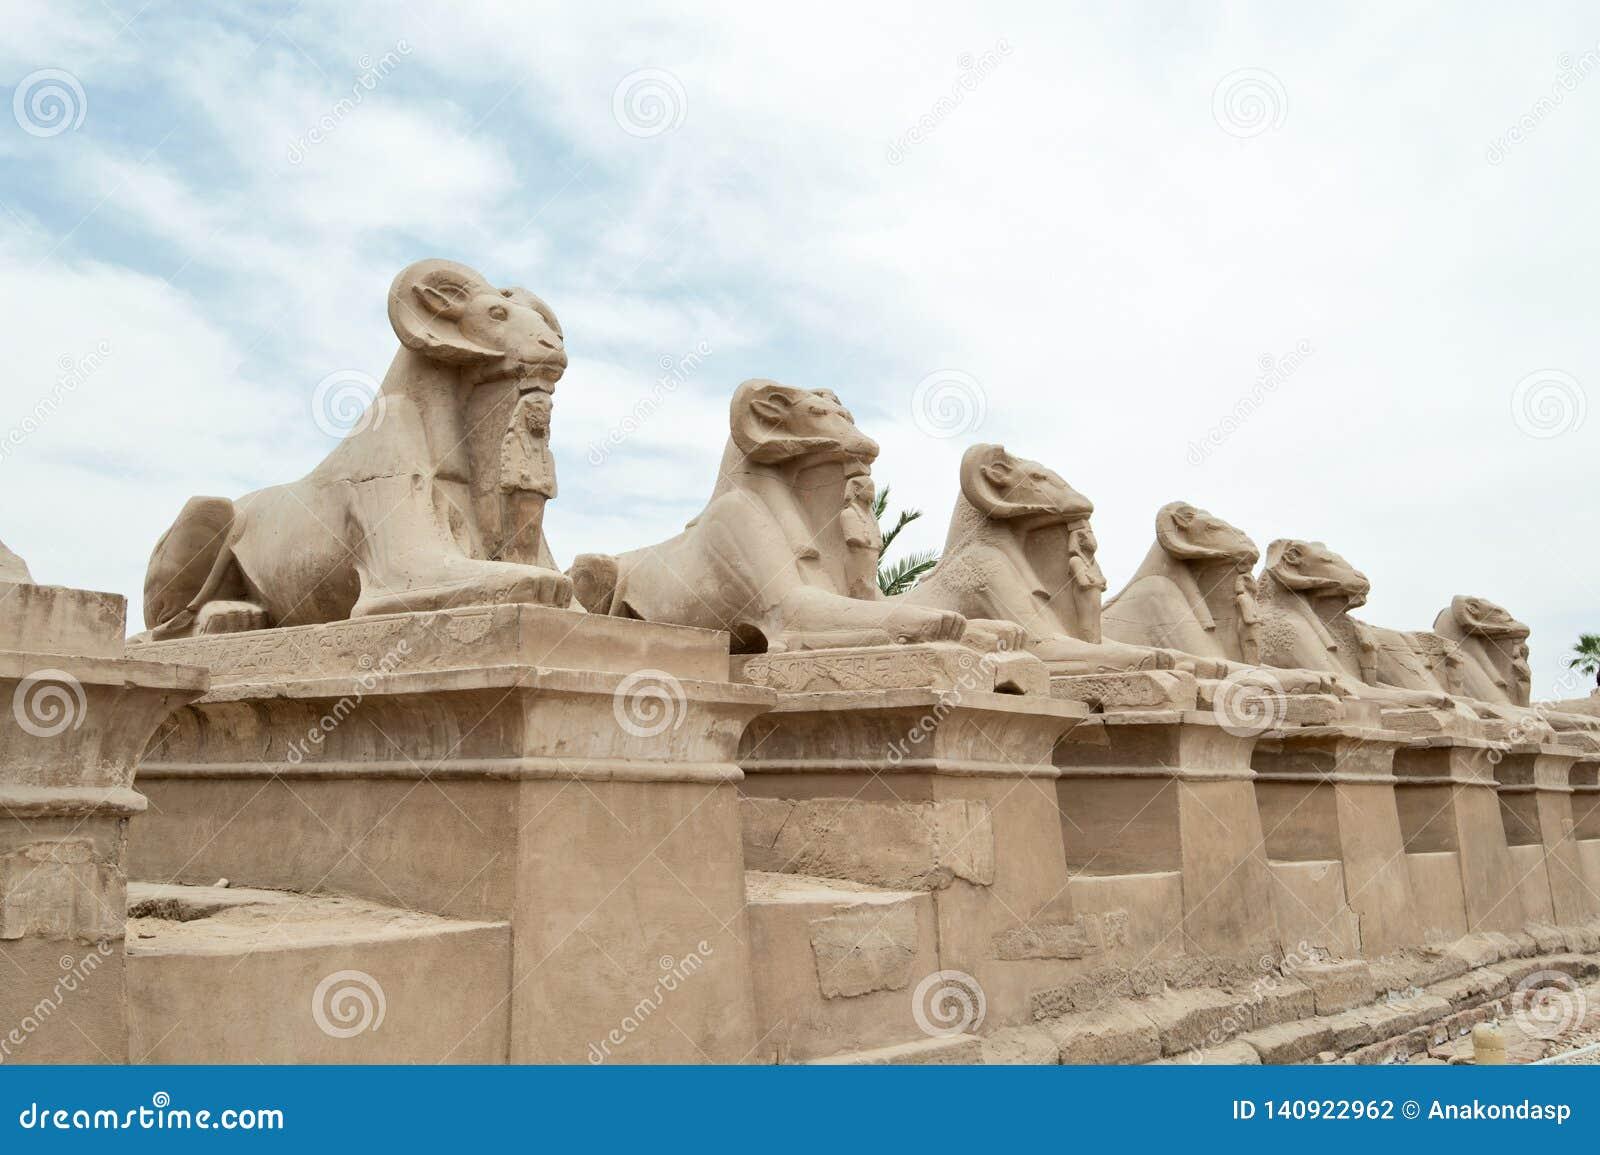 Estatuas de Egipto antiguo de la esfinge en templo del karnak de Luxor